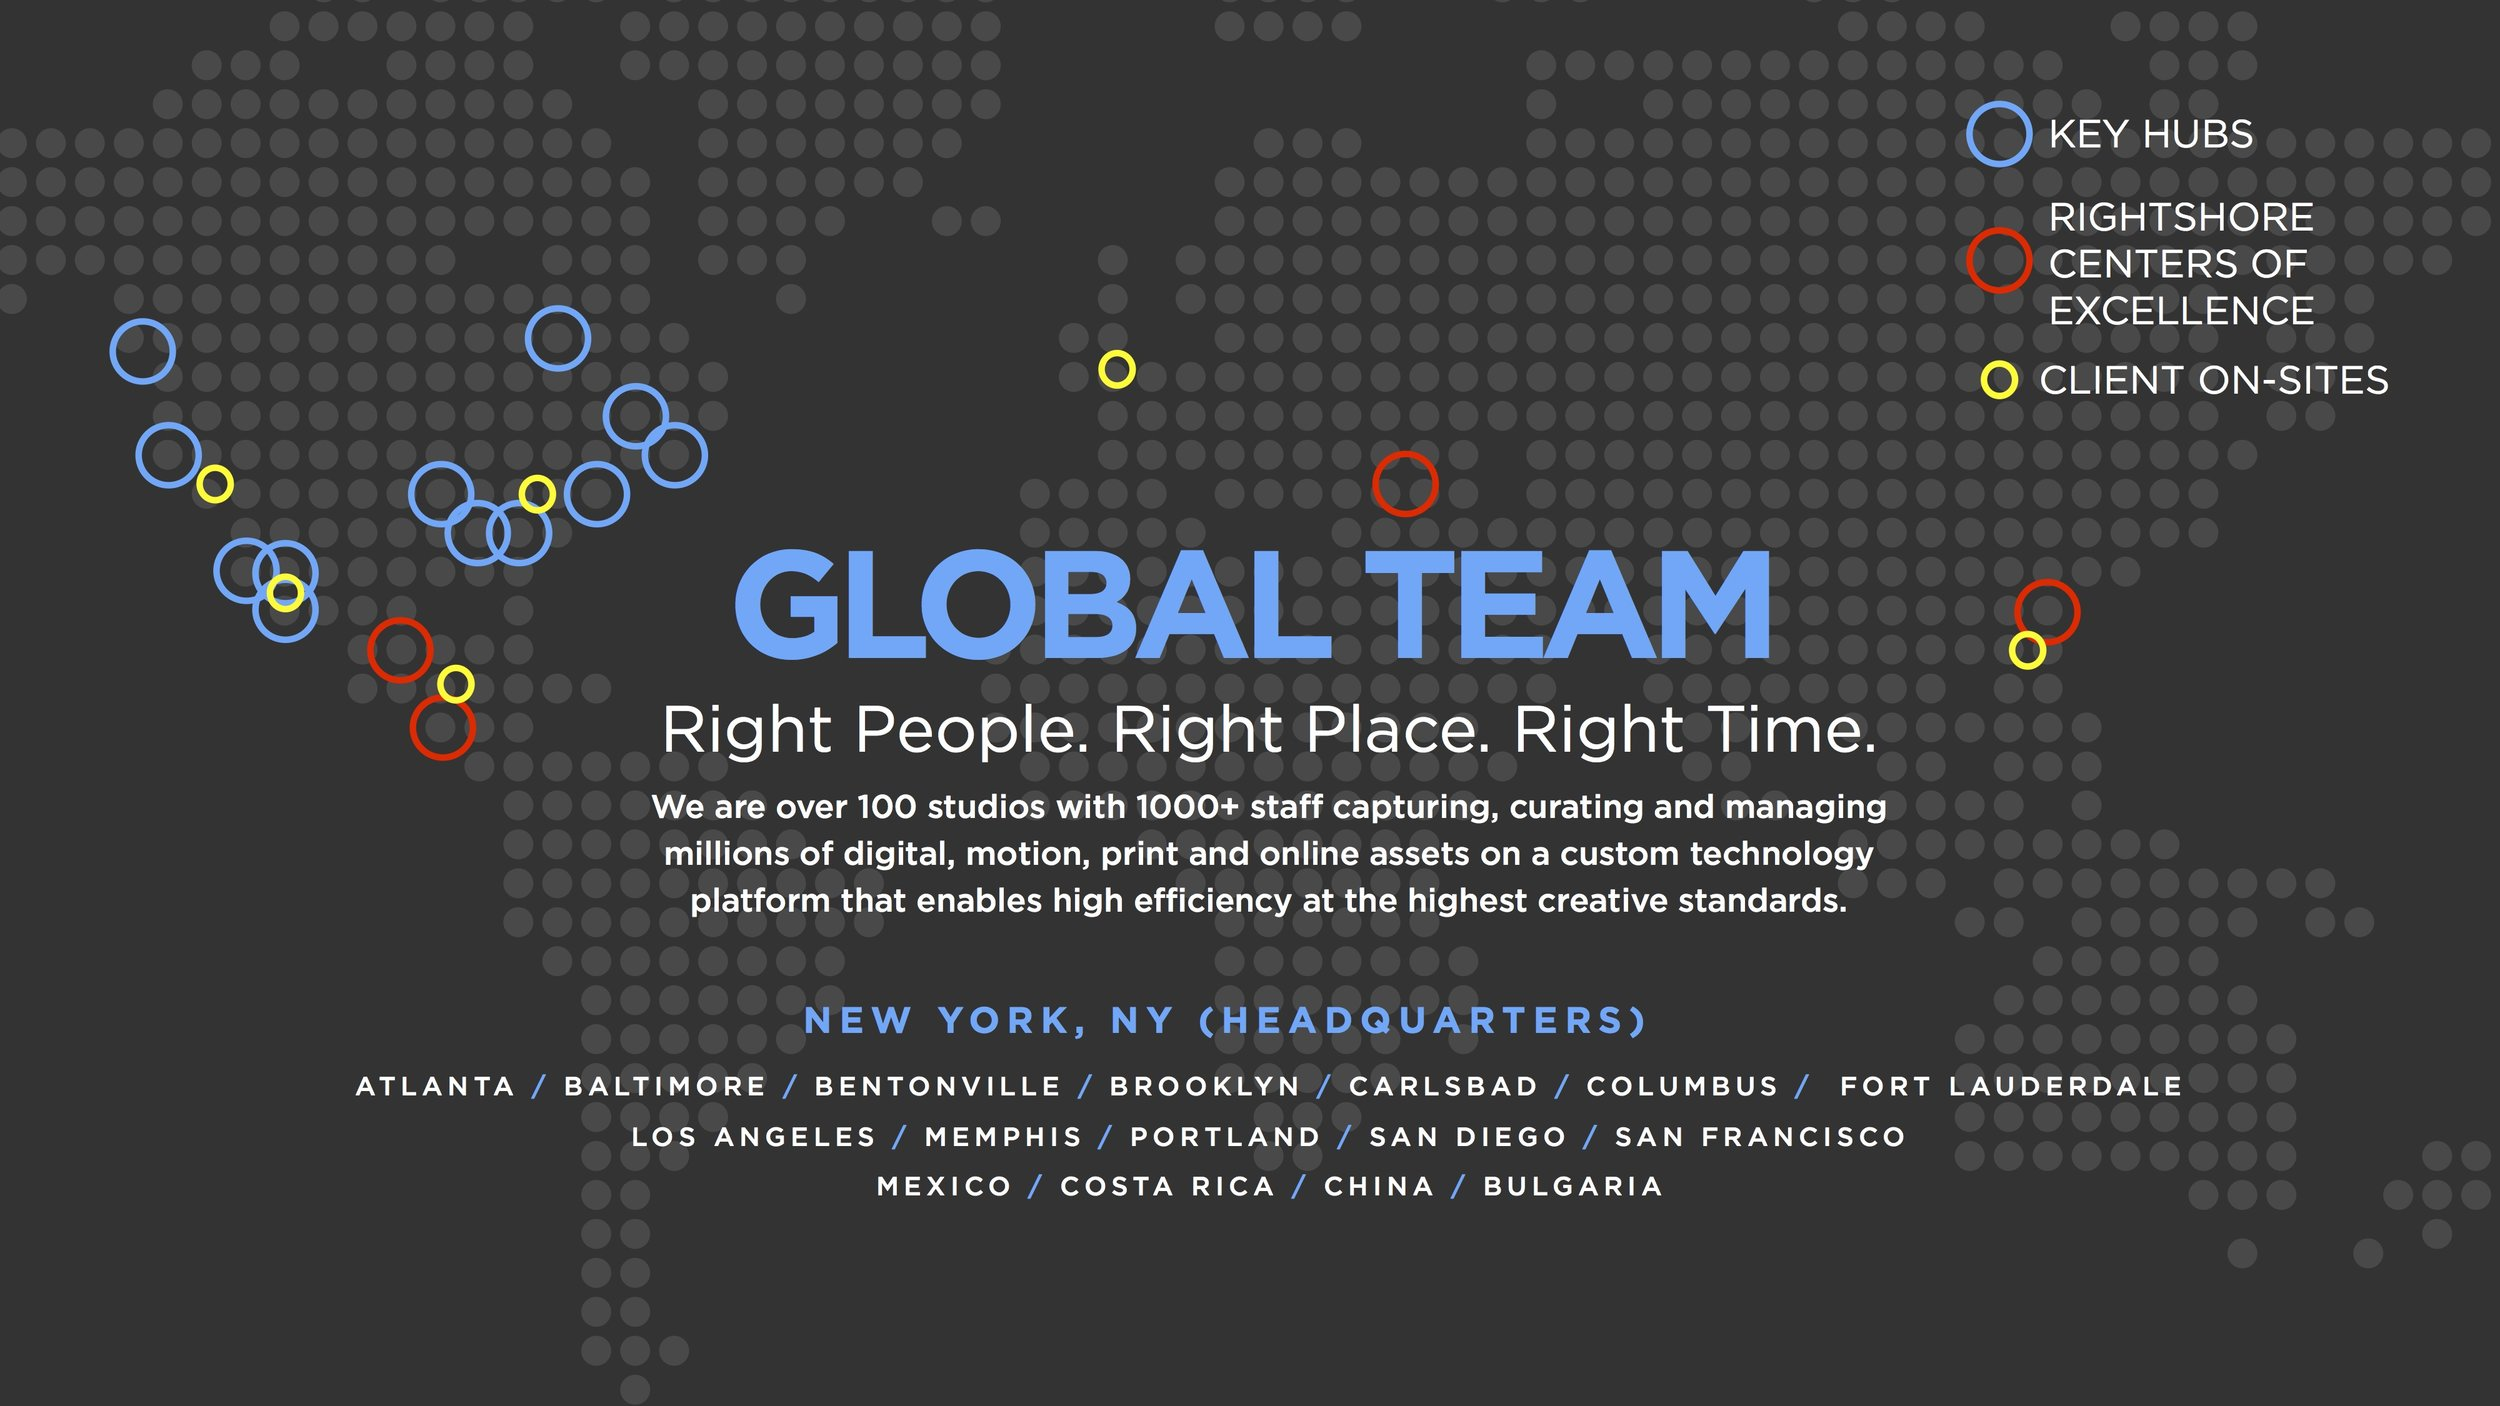 creativedrivegeneralcapabilities-travel (1)-6.jpg